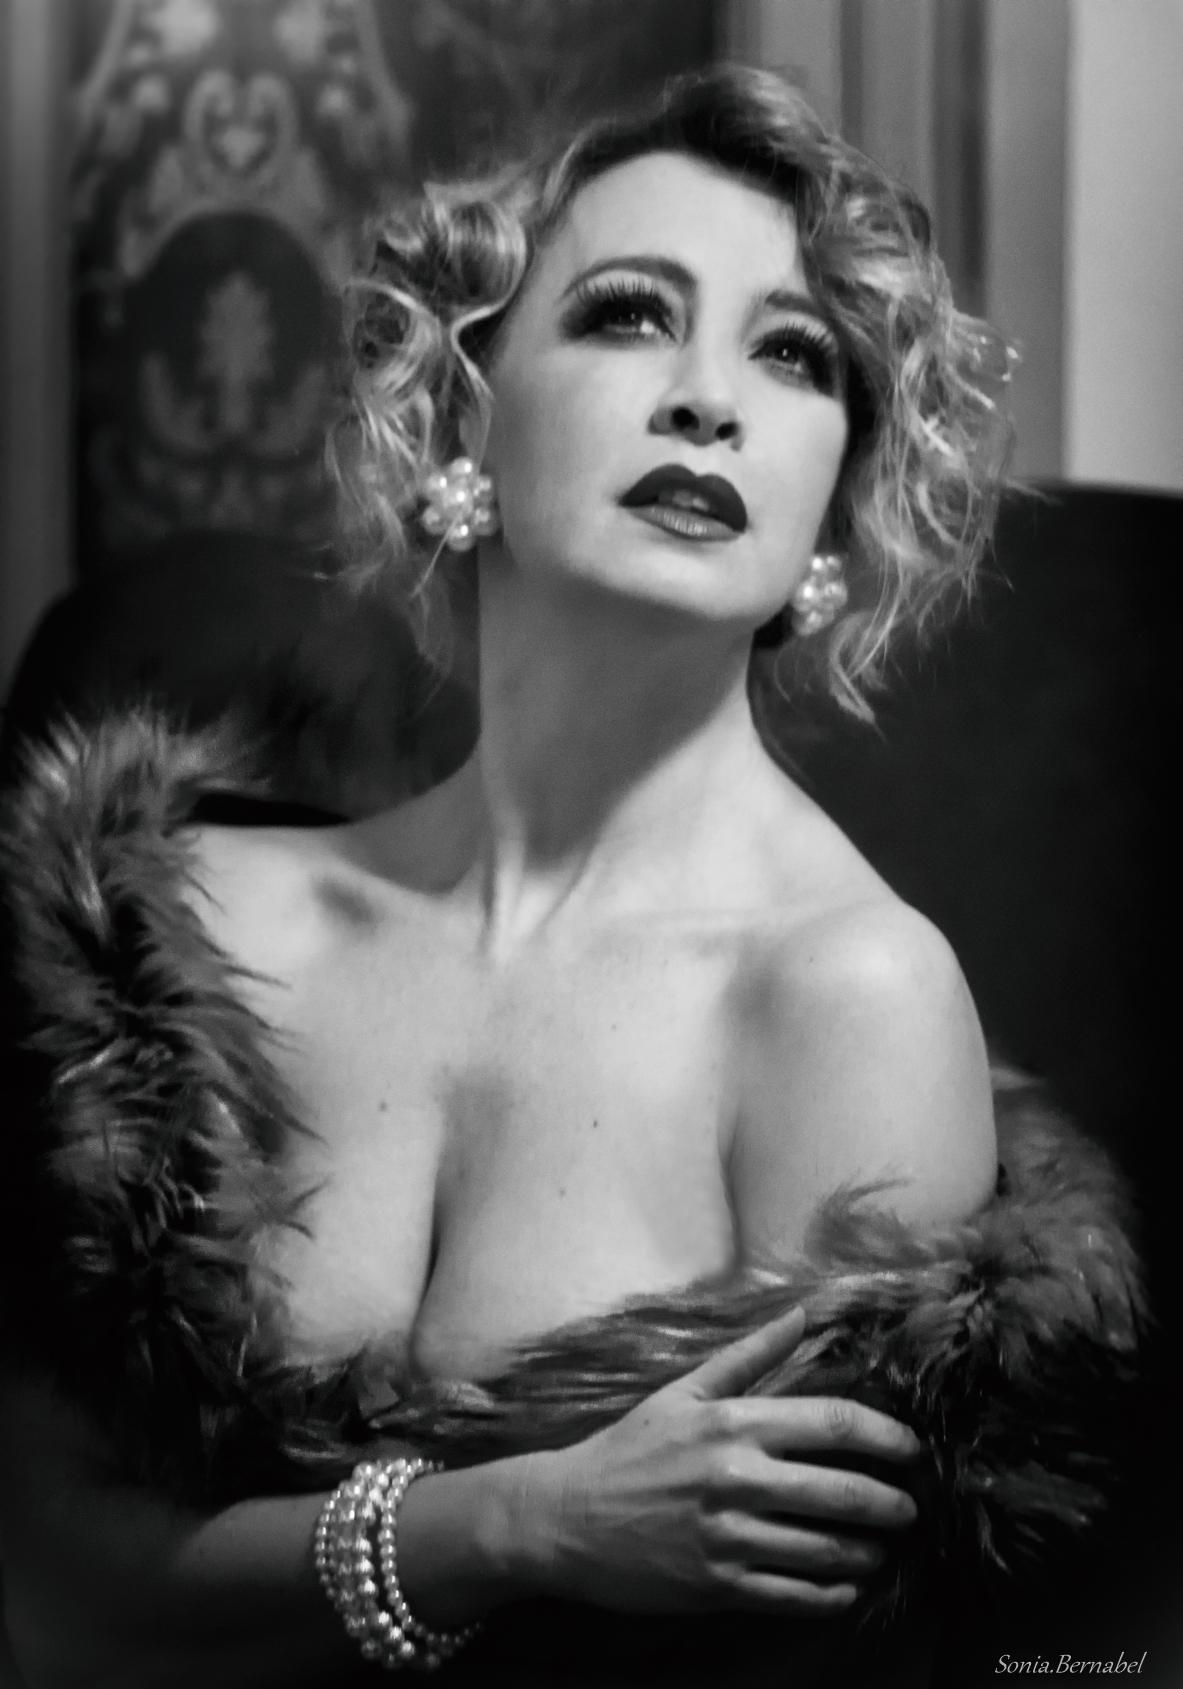 photographe Sonia Bernabel. 2019